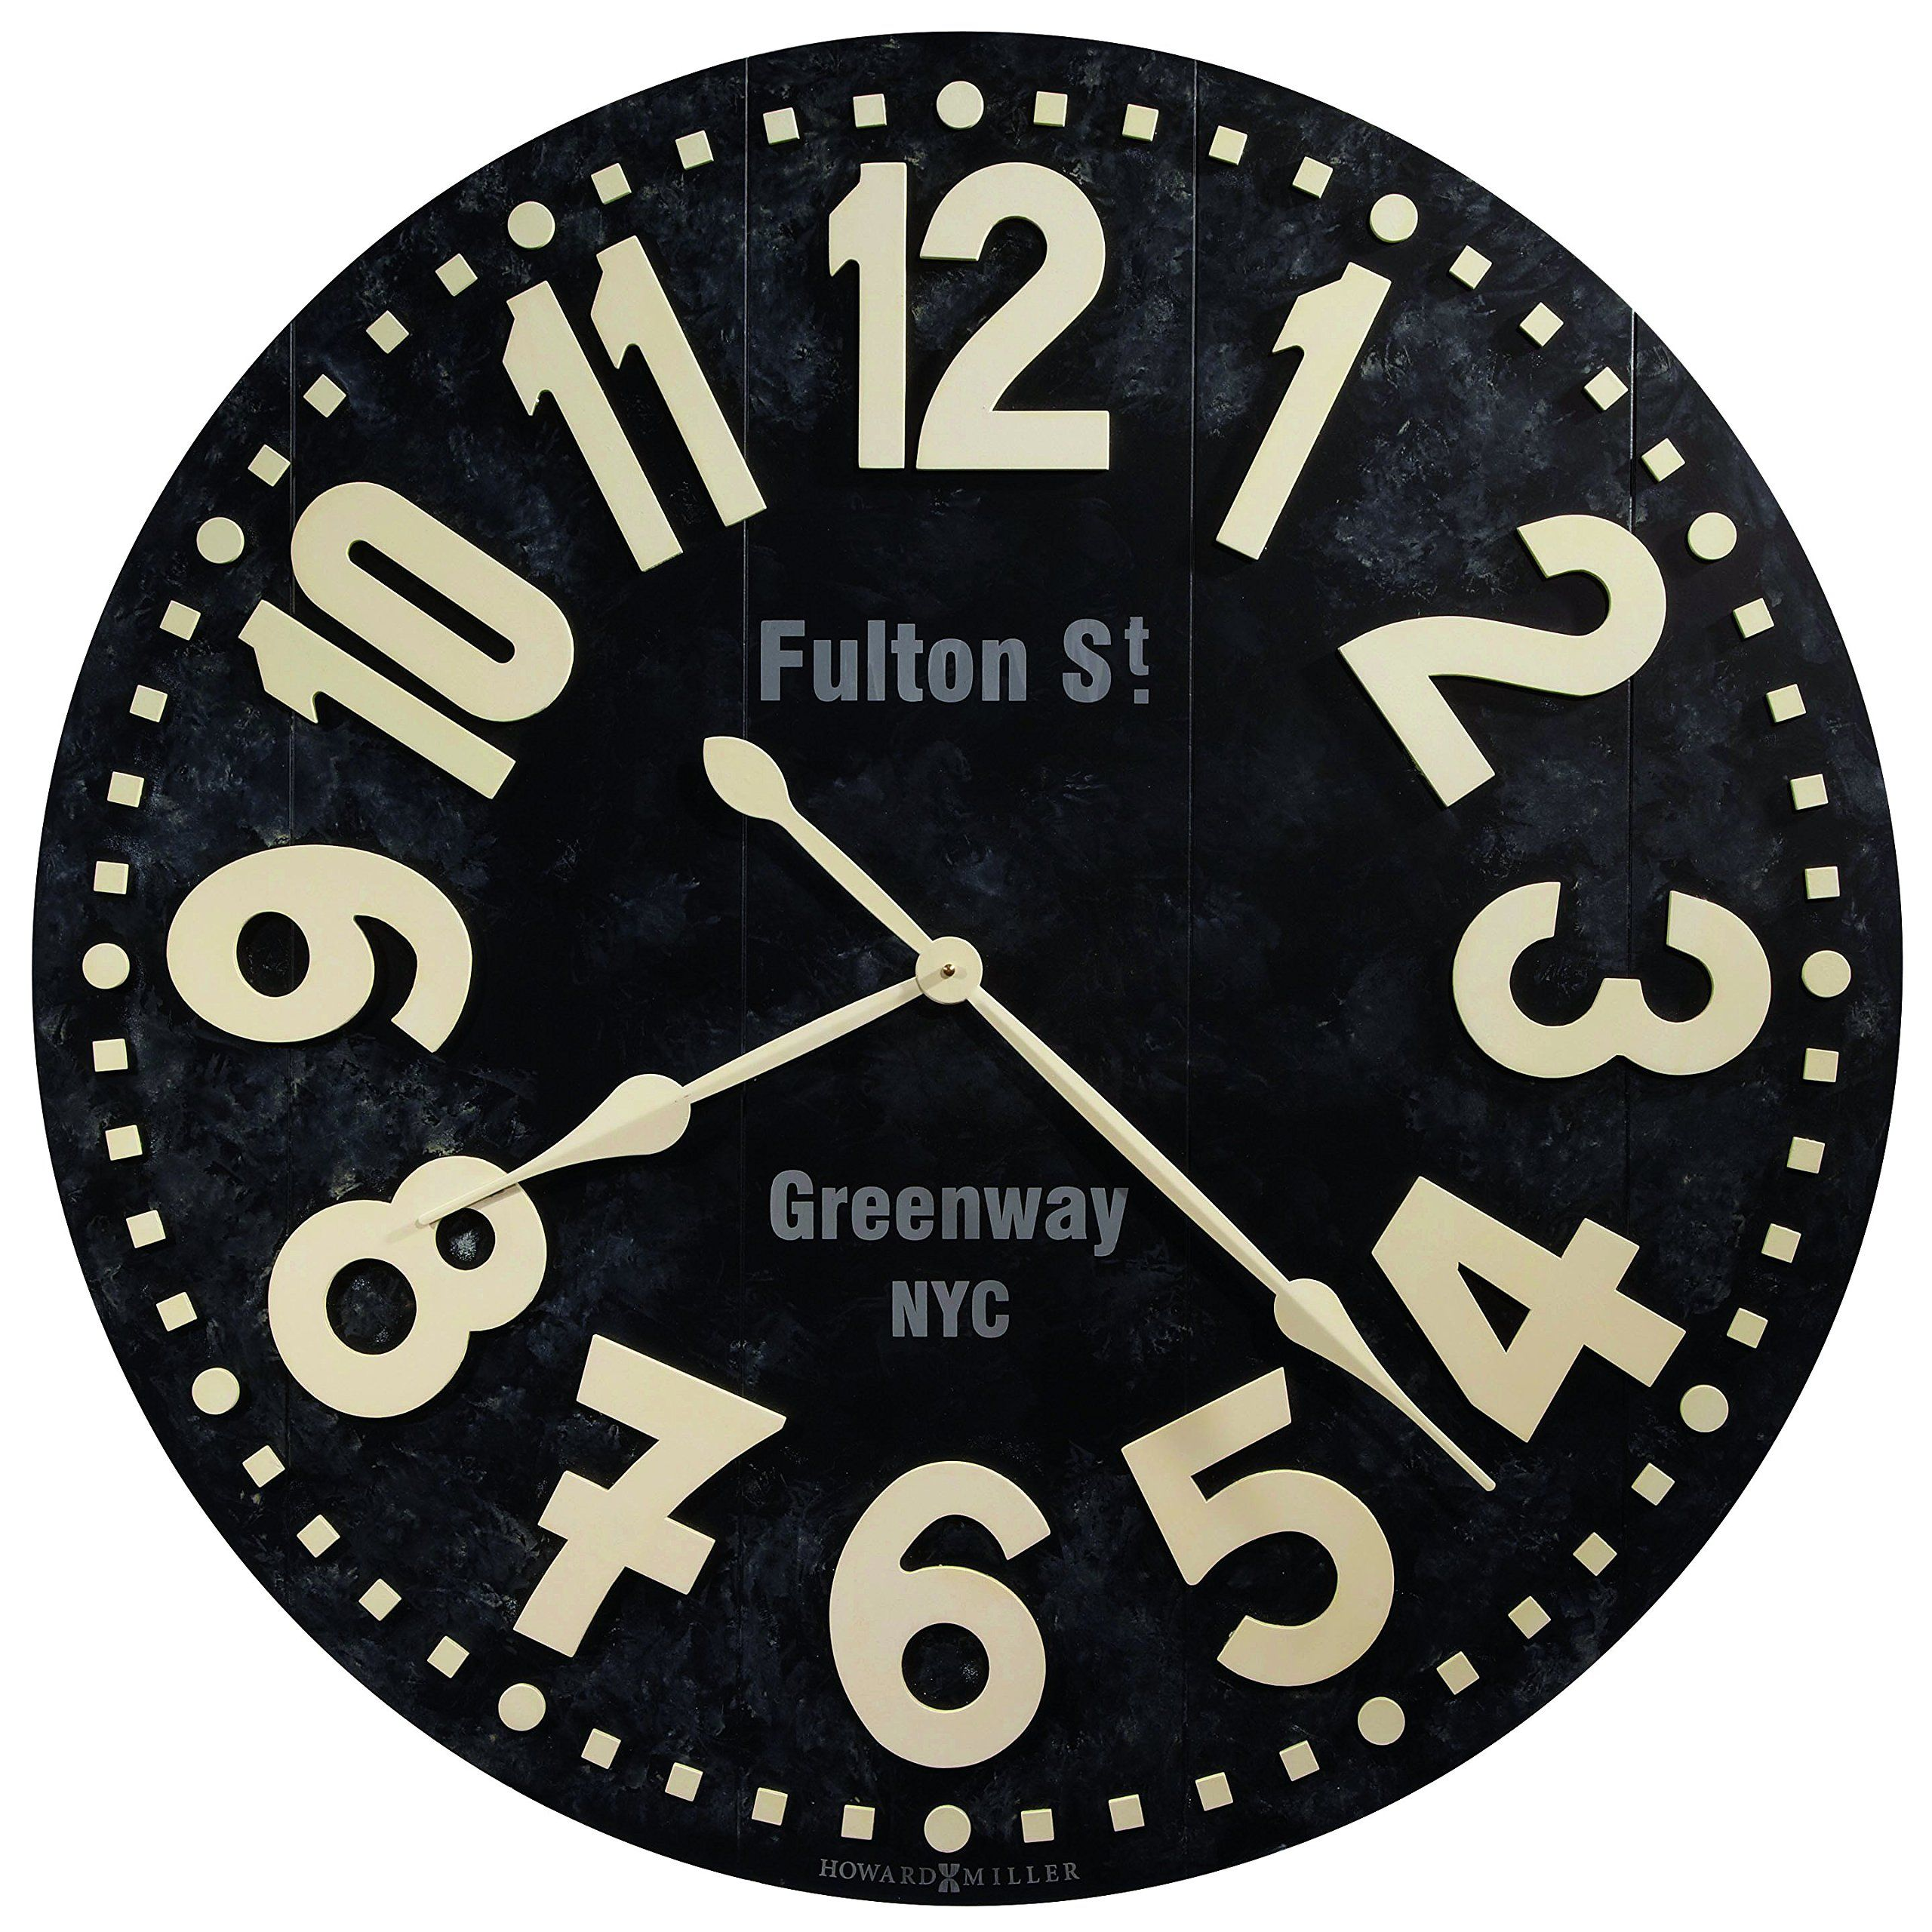 Robot Check Oversized Wall Clock Black Wall Clock Large Wall Clock